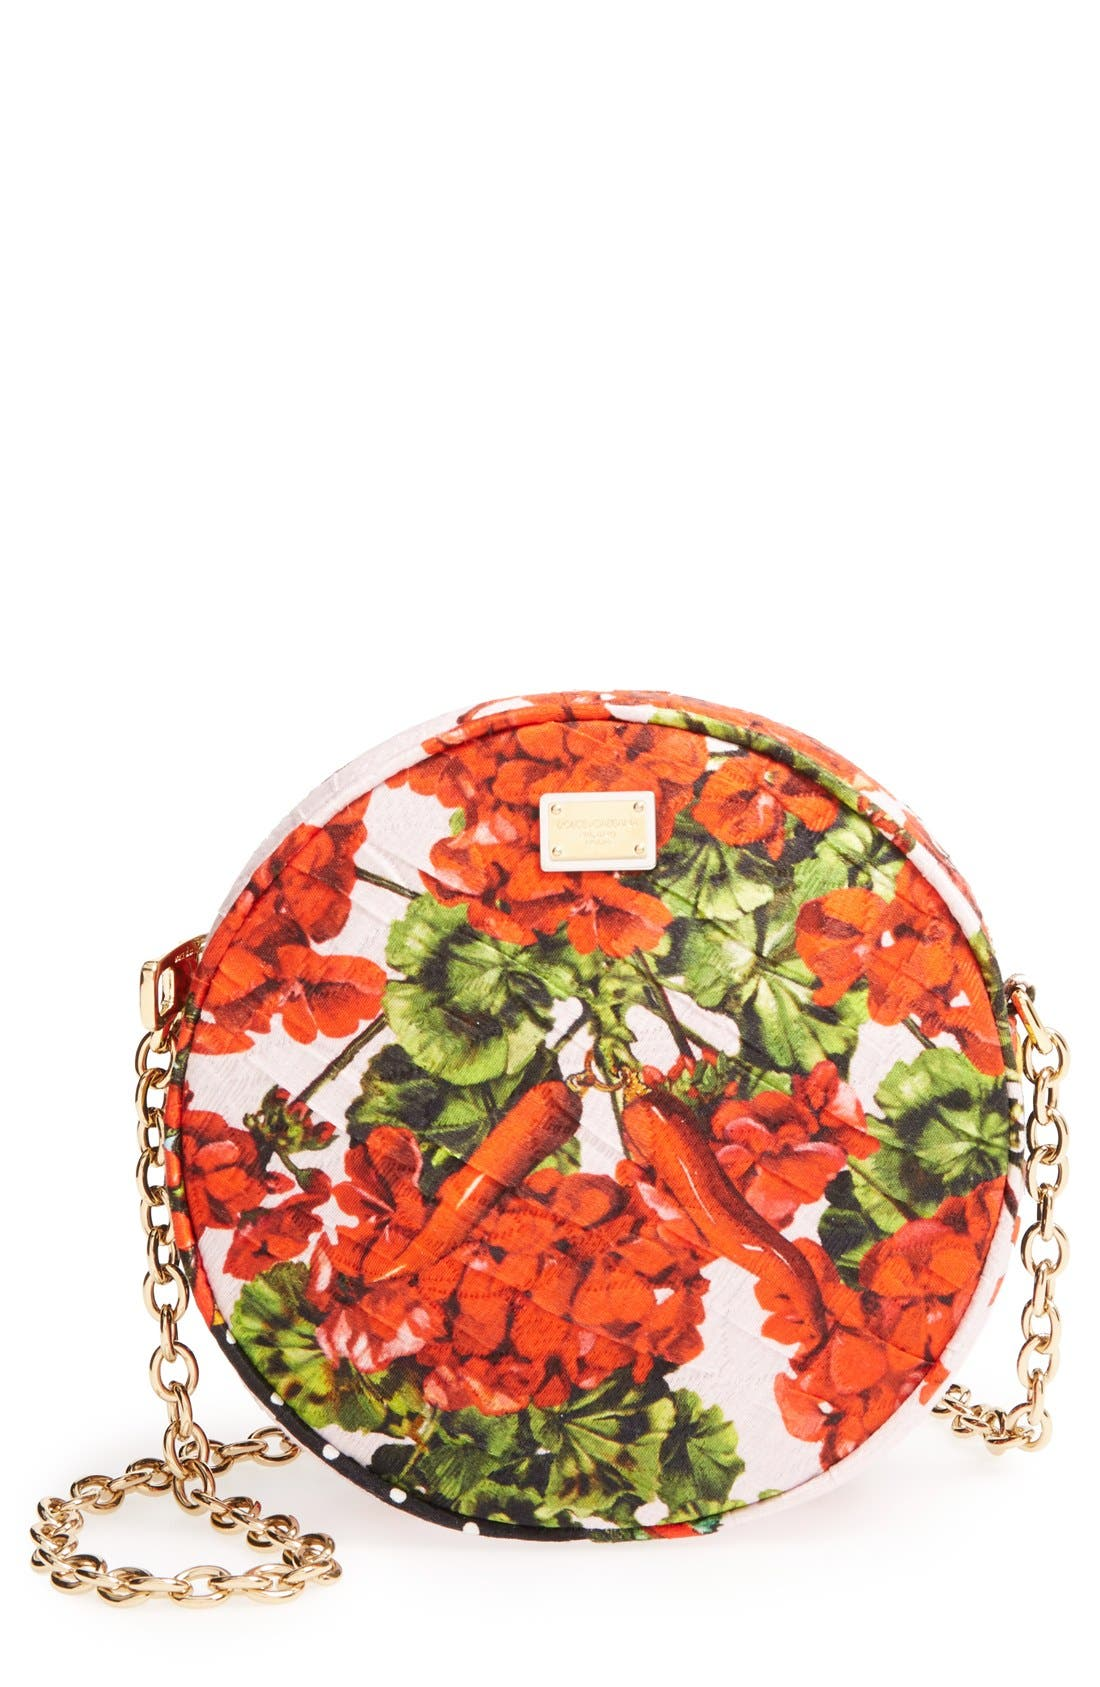 Alternate Image 1 Selected - Dolce&Gabbana 'Miss Glam' Floral Print Crossbody Bag